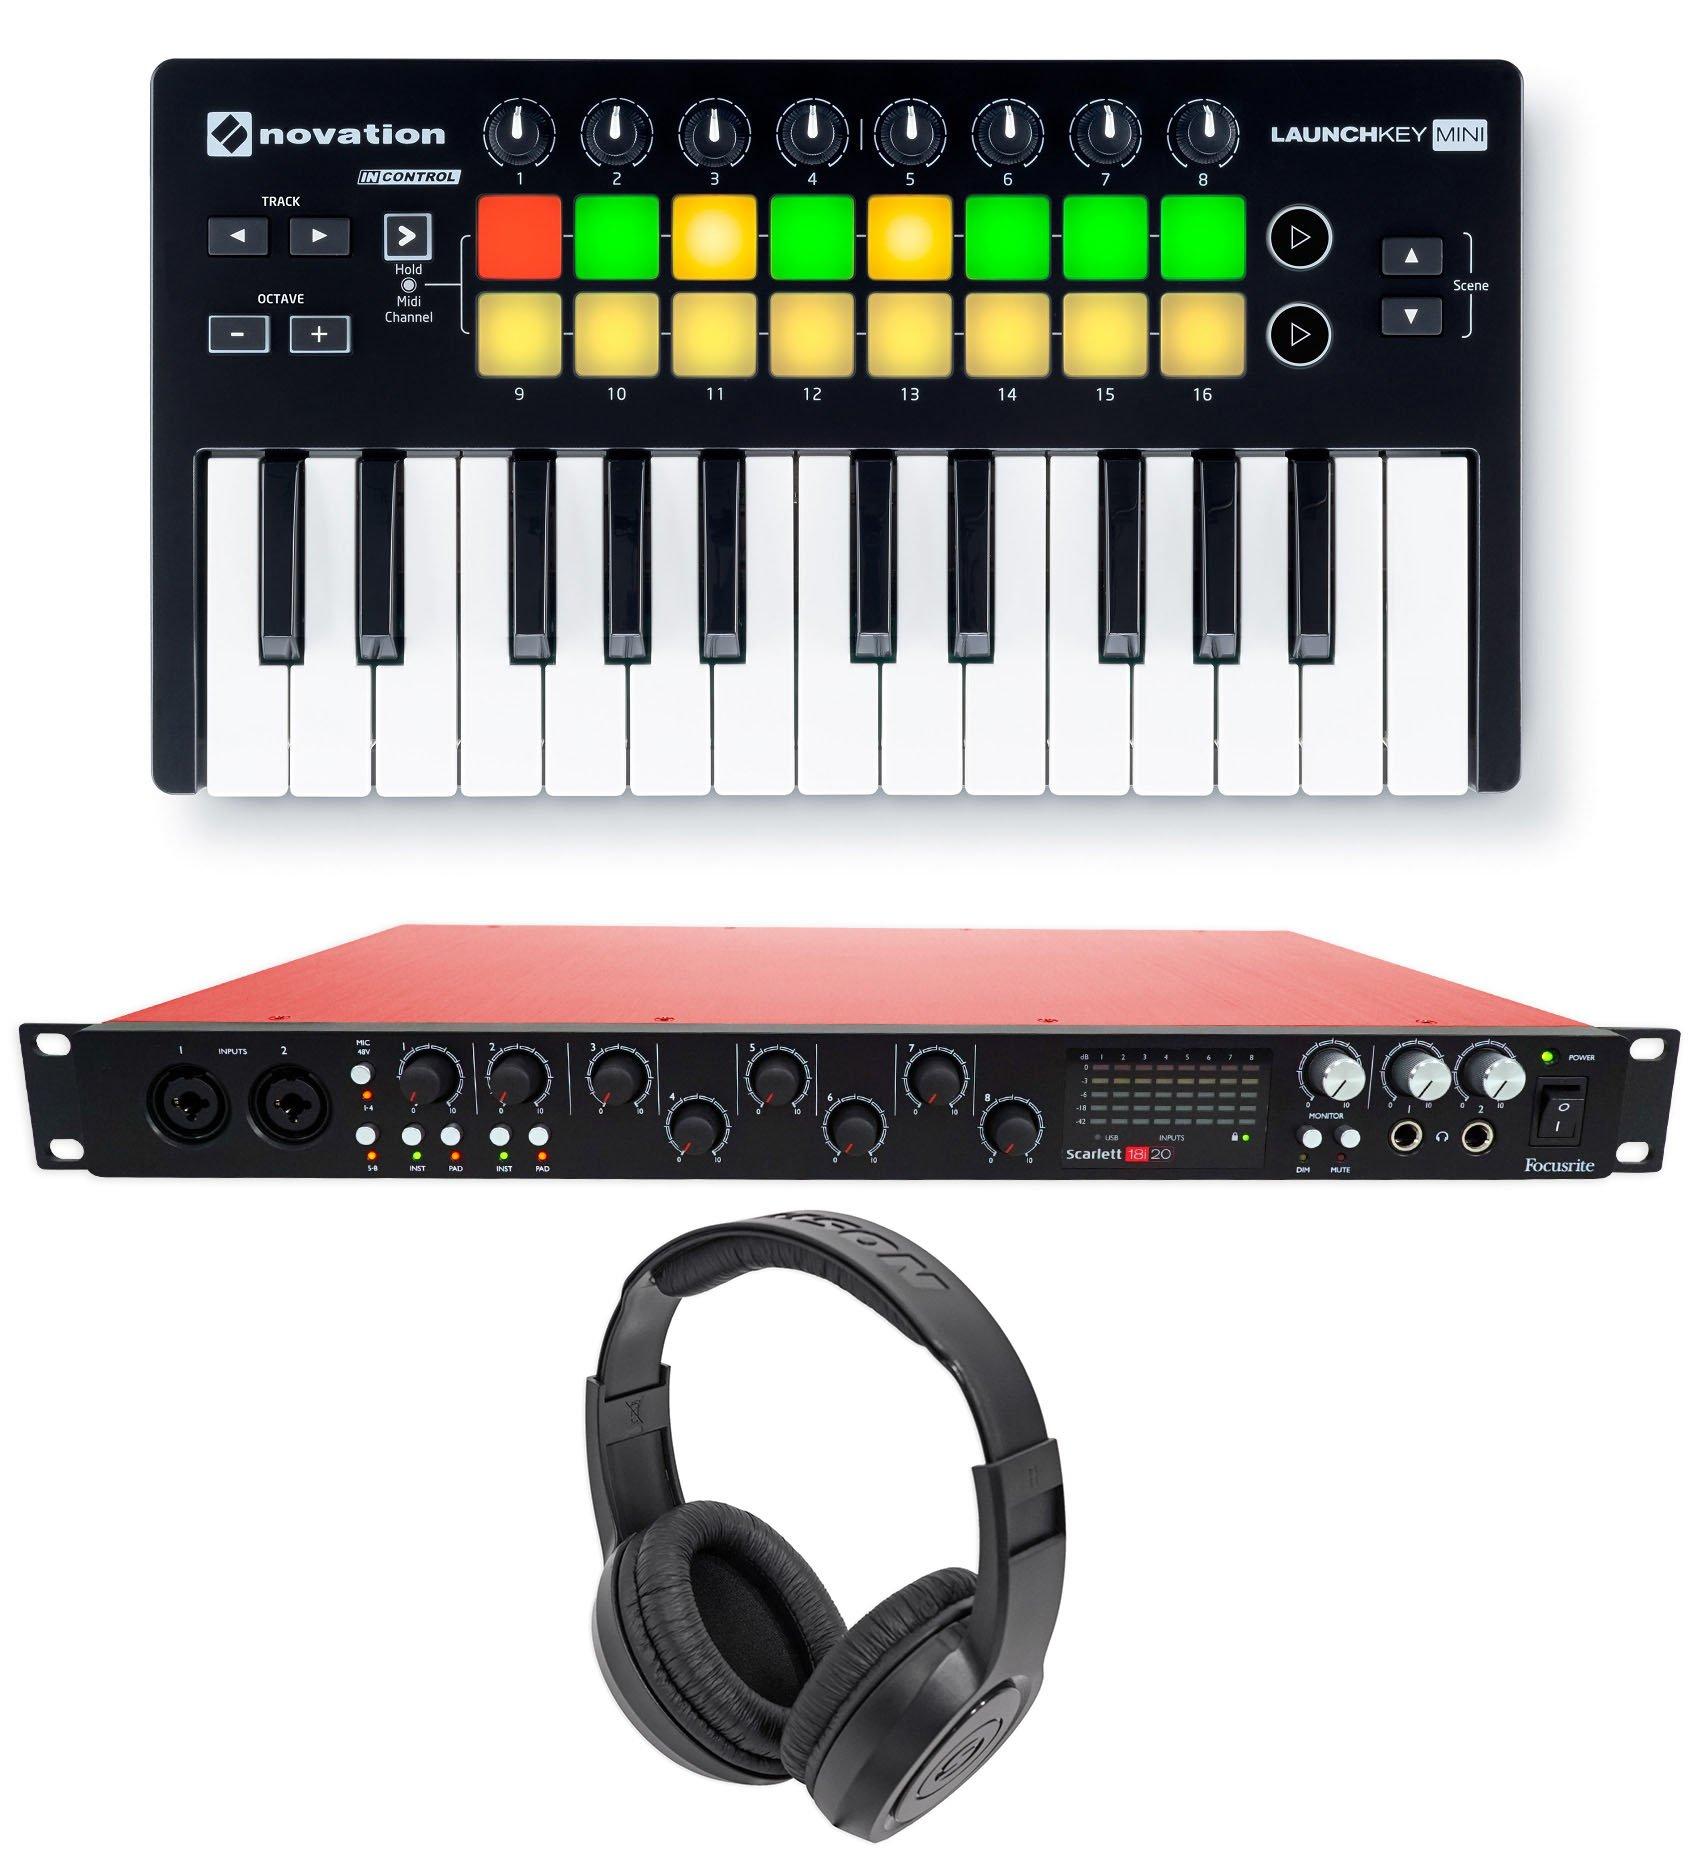 Focusrite SCARLETT 18I20 2.0 Audio Recording Interface+Launchkey Mini+Headphones